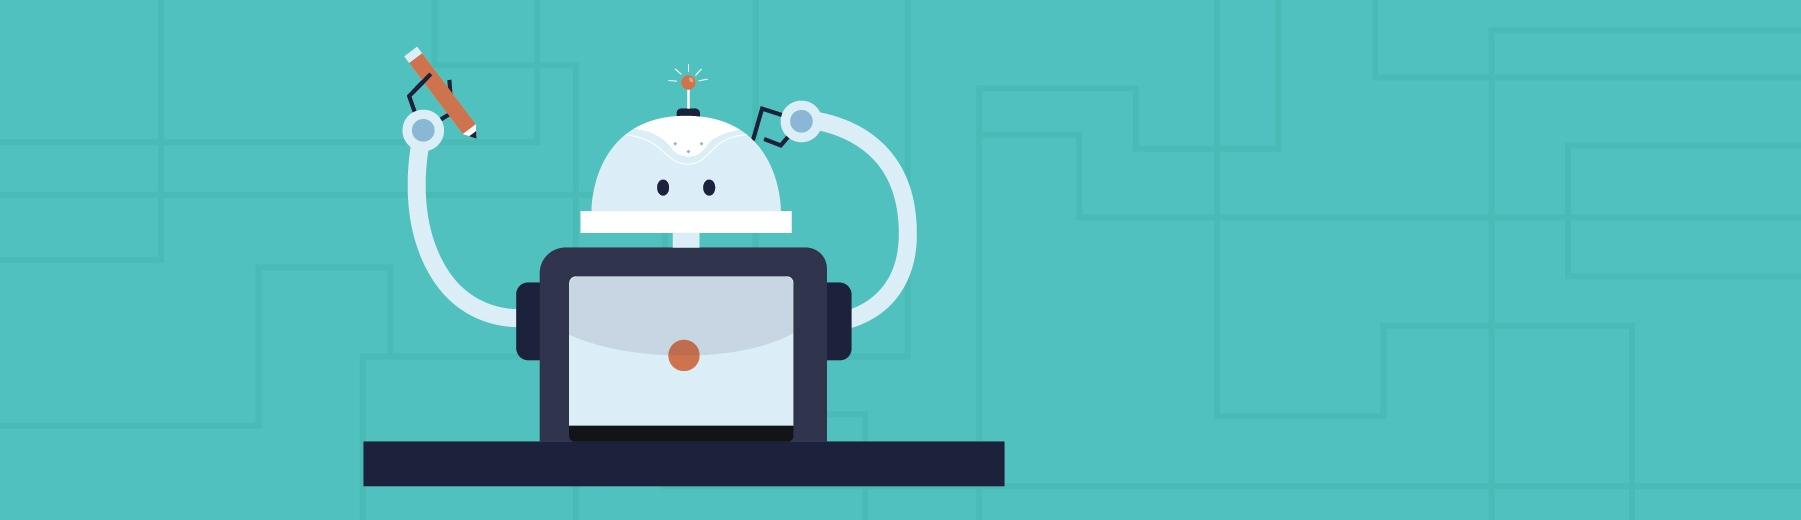 editoriale guardian intelligenza artificiale